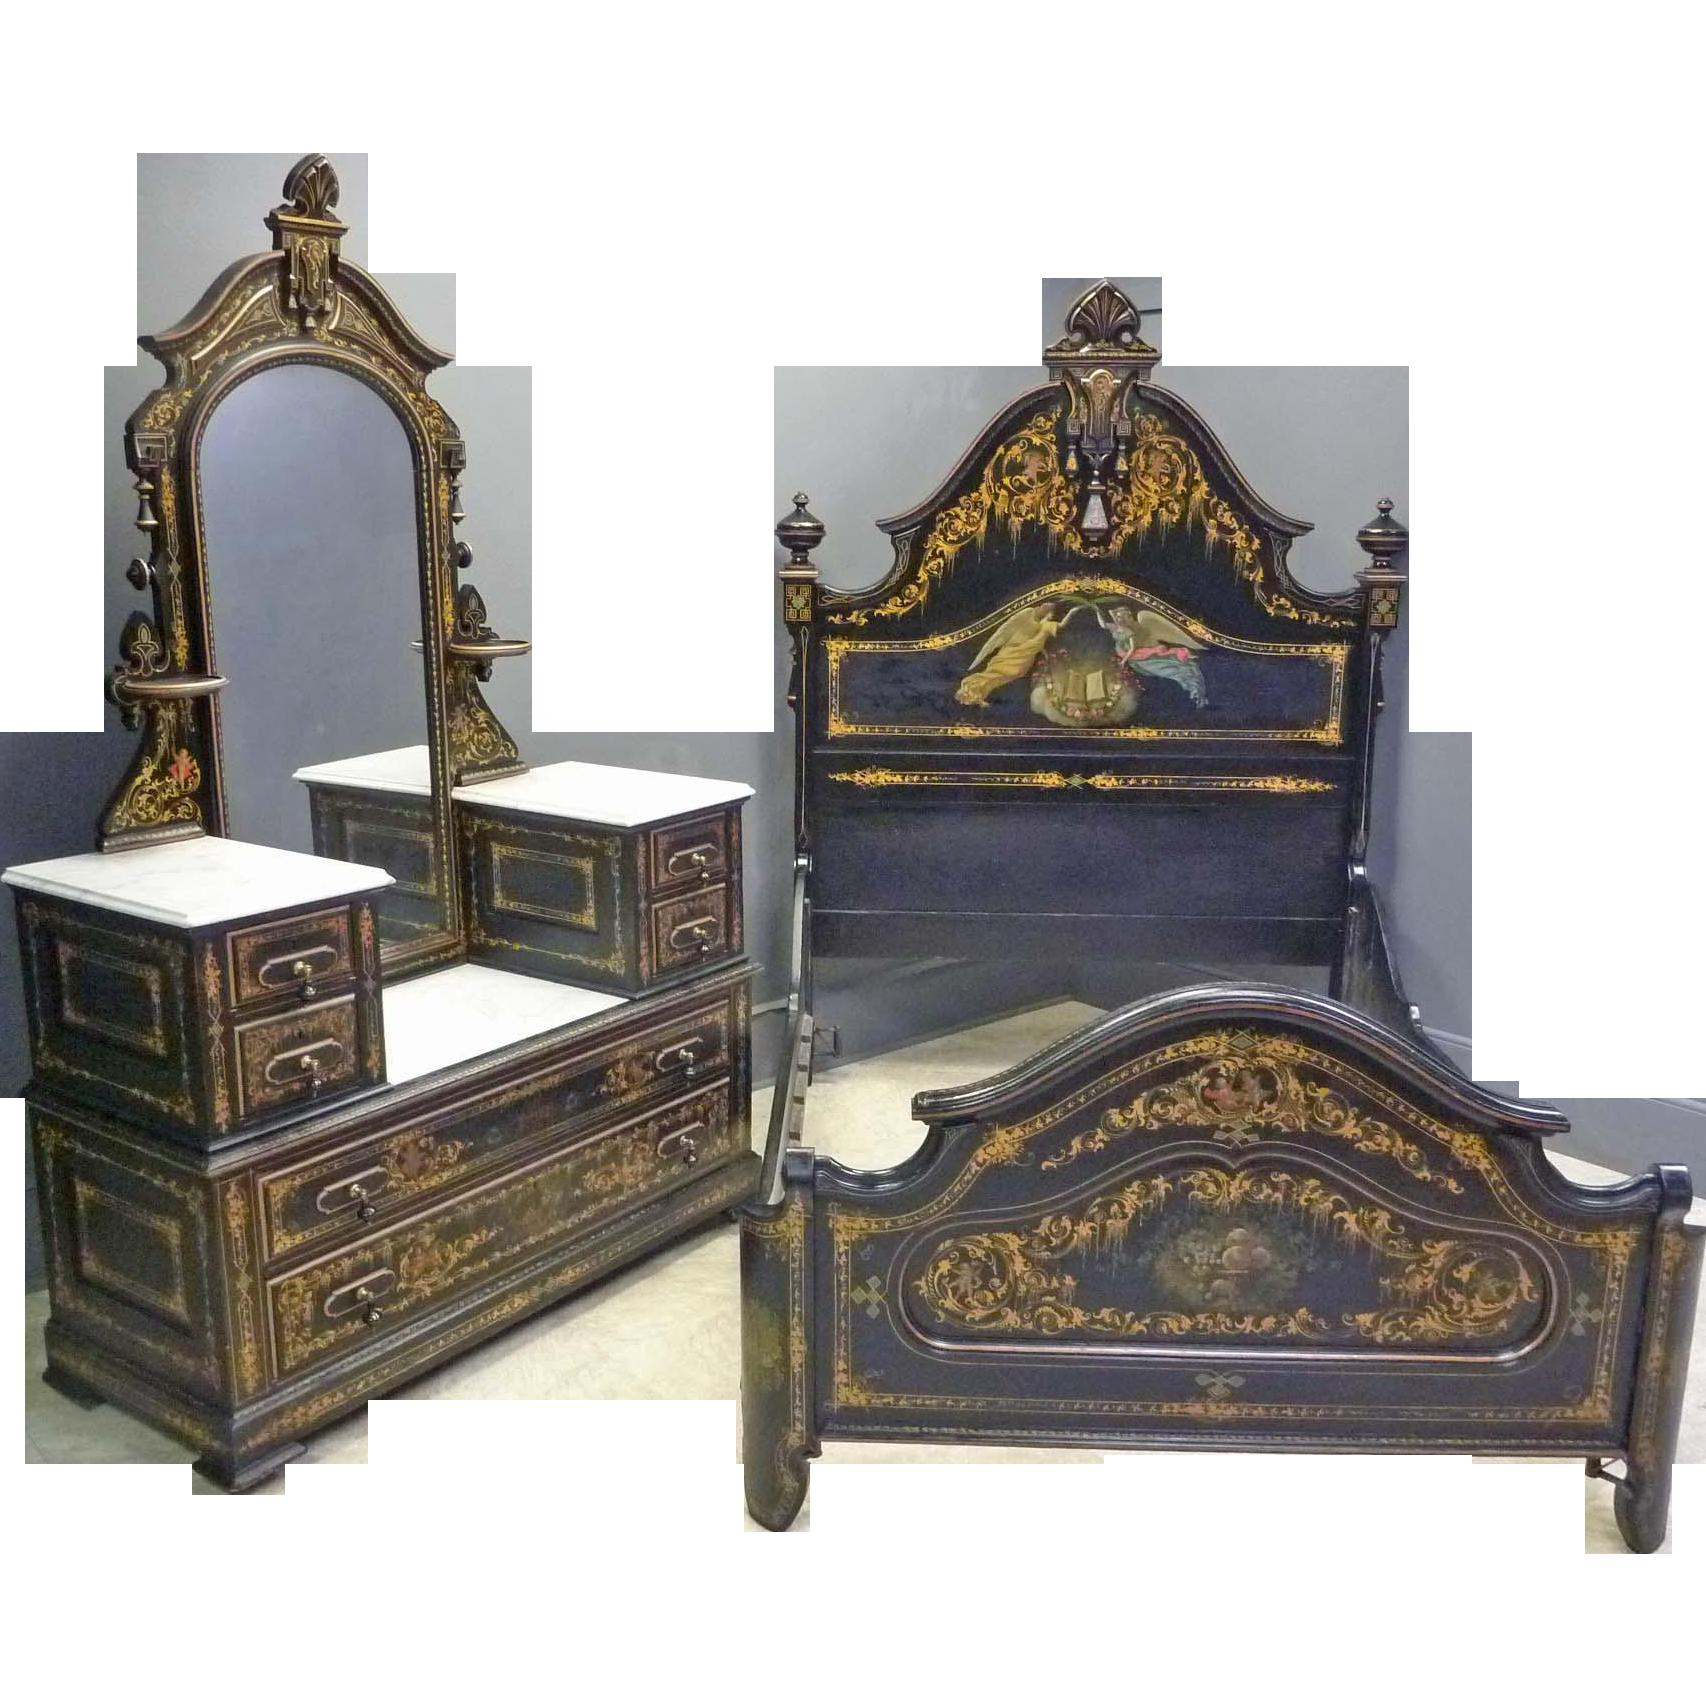 Rare Cottage Bedroom Set by Hart Ware & Co., Philadelphia